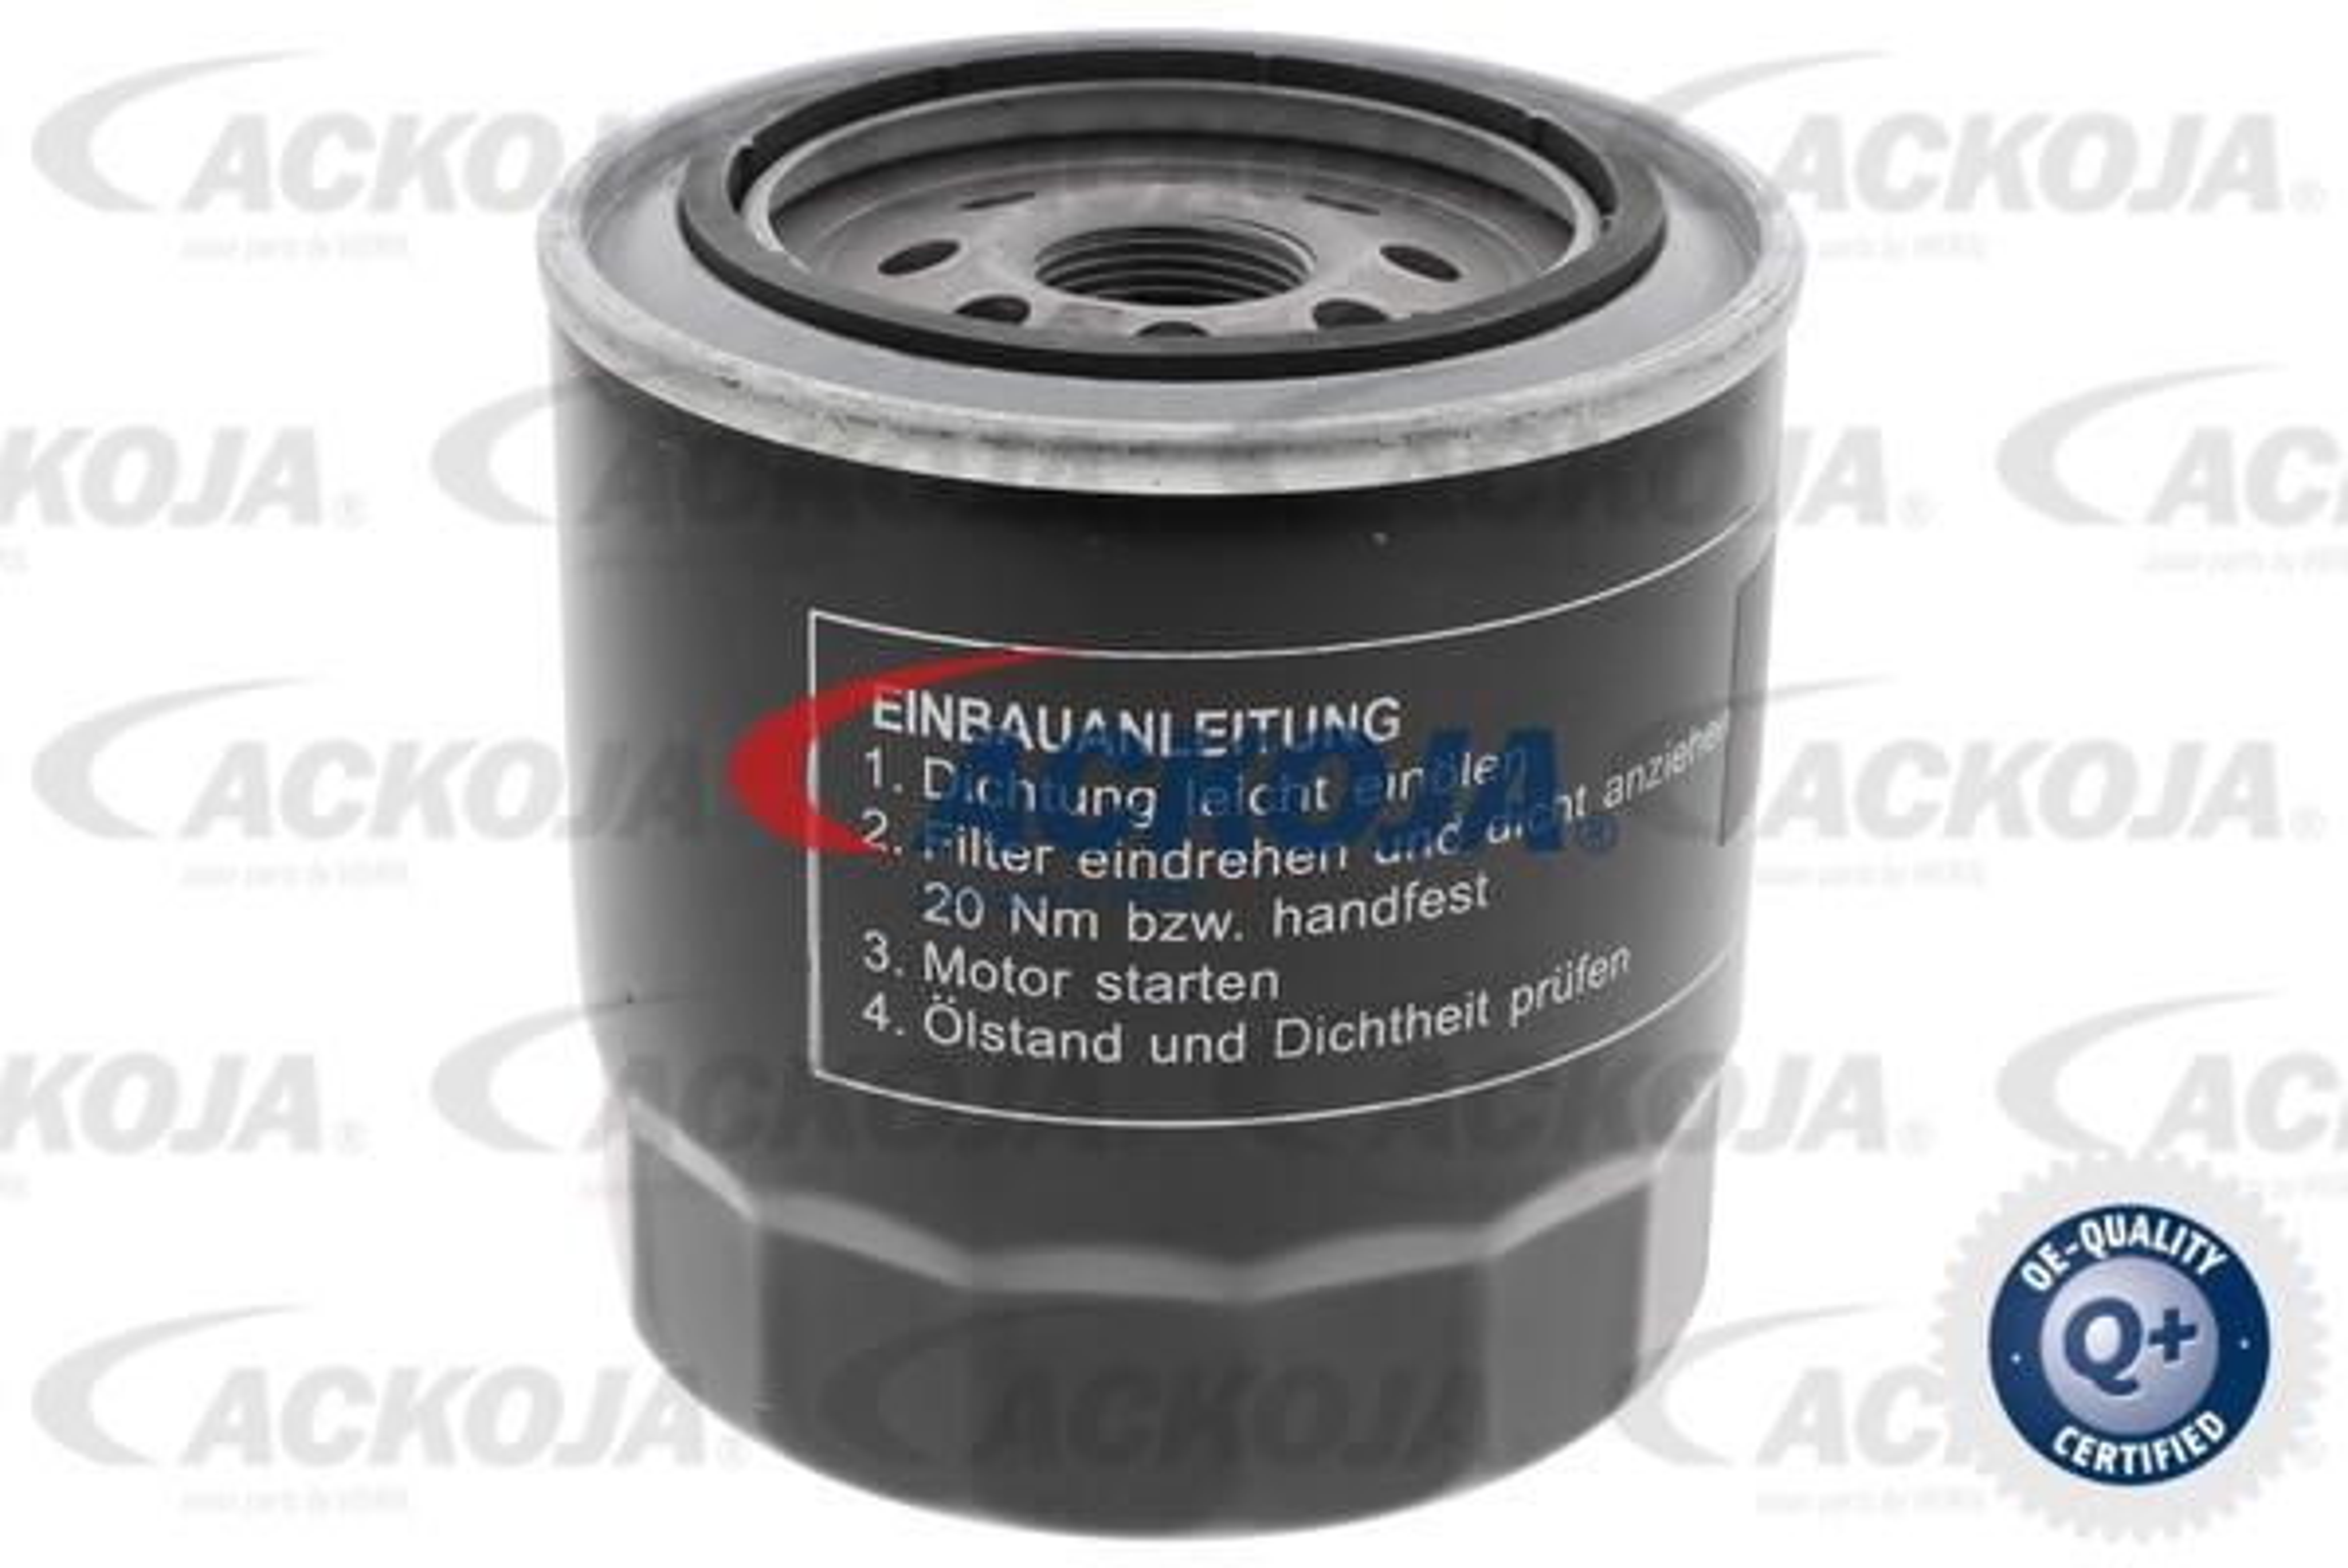 Motorölfilter A70-0502 ACKOJA A70-0502 in Original Qualität